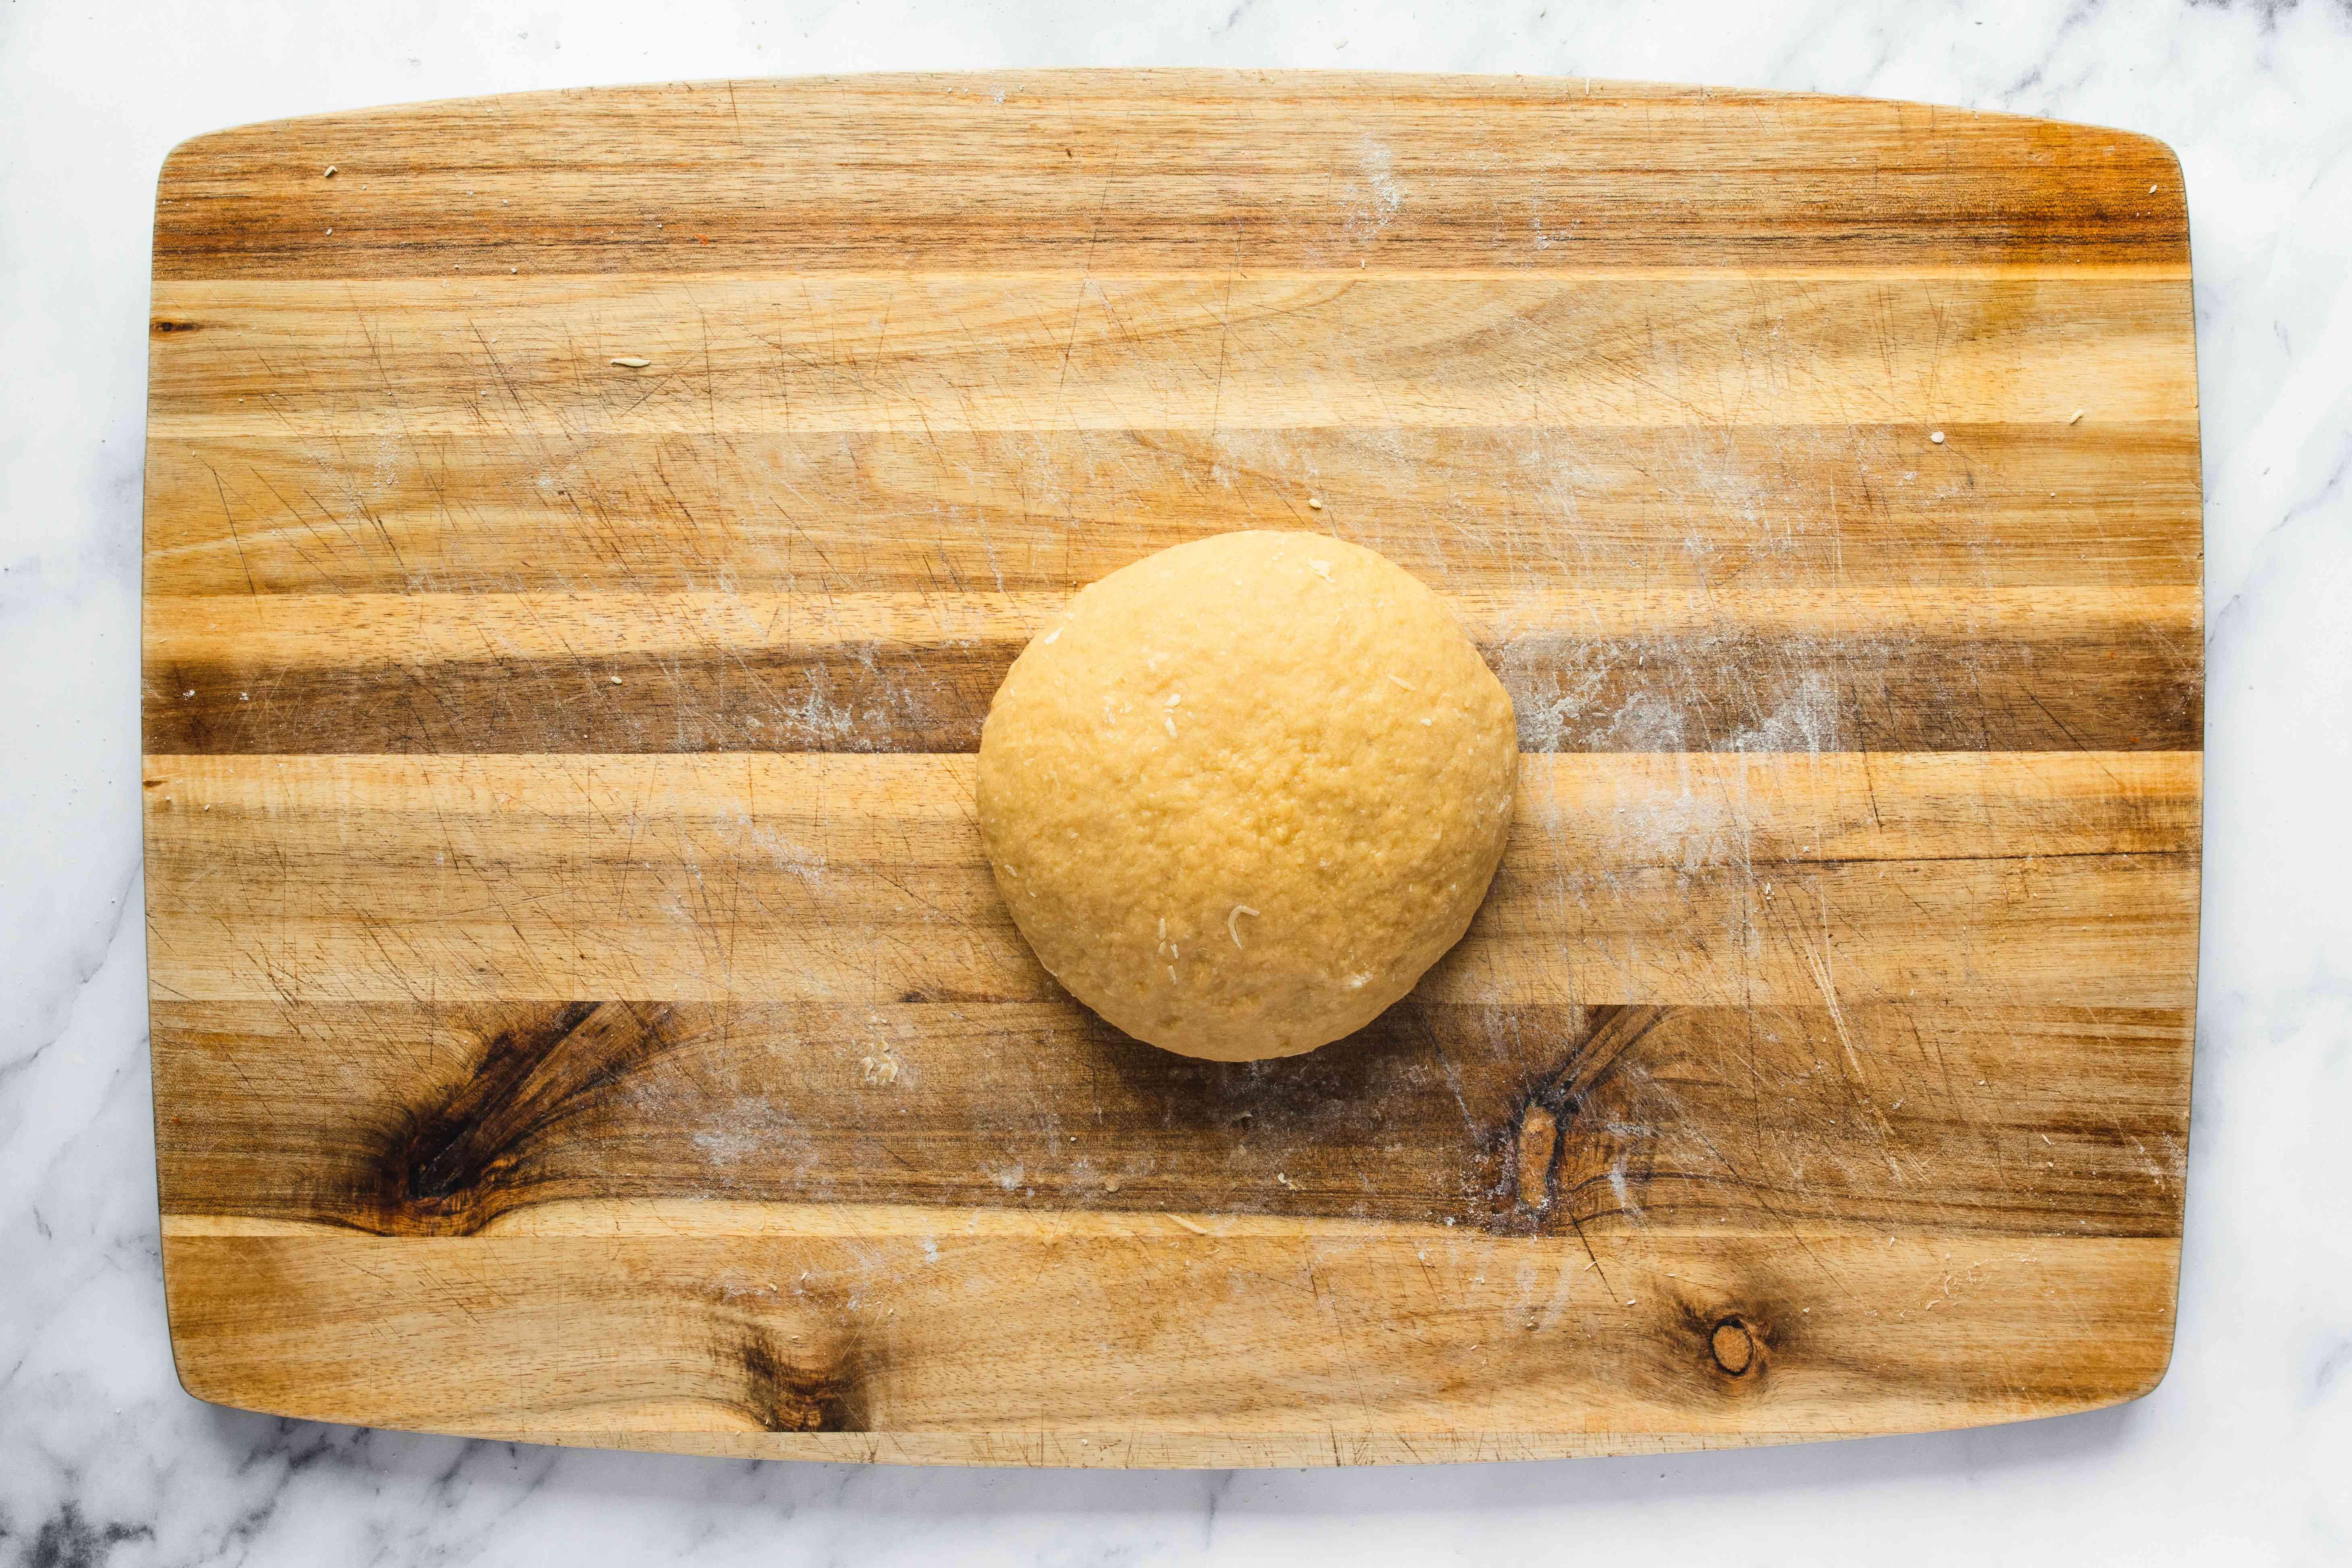 Combine flour and sugar